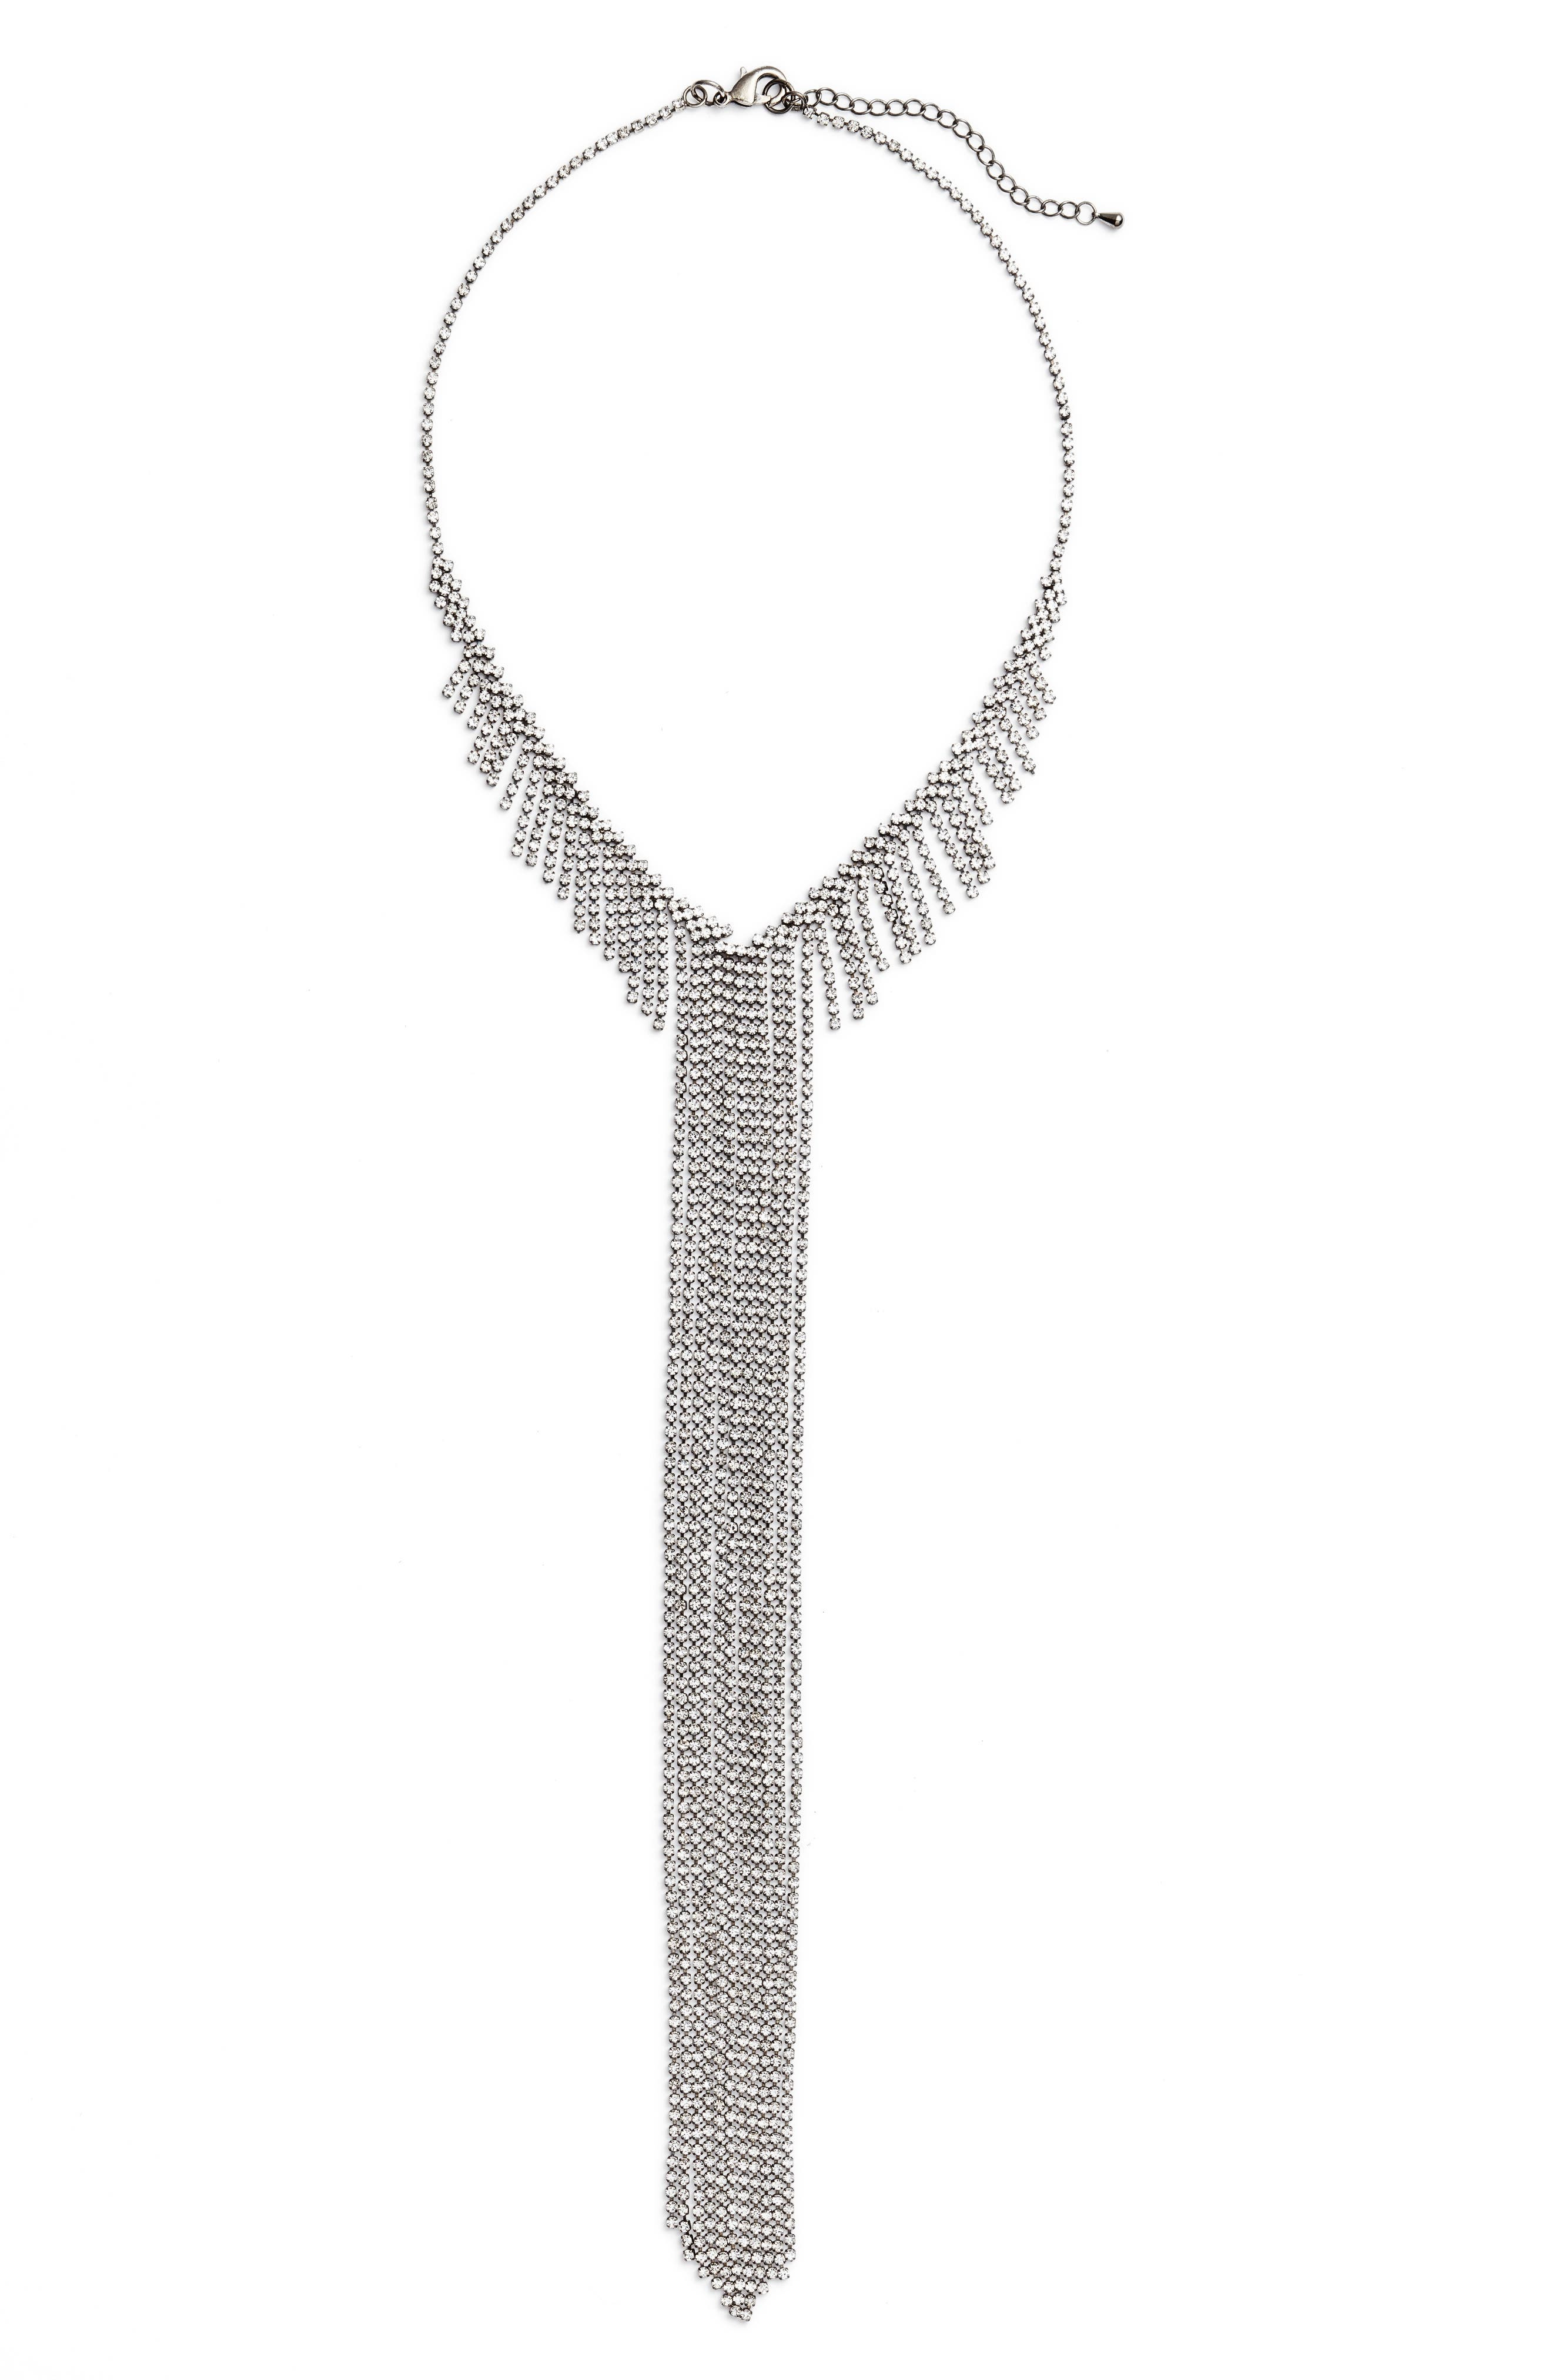 Main Image - CRISTABELLE Fringe Frontal Necklace